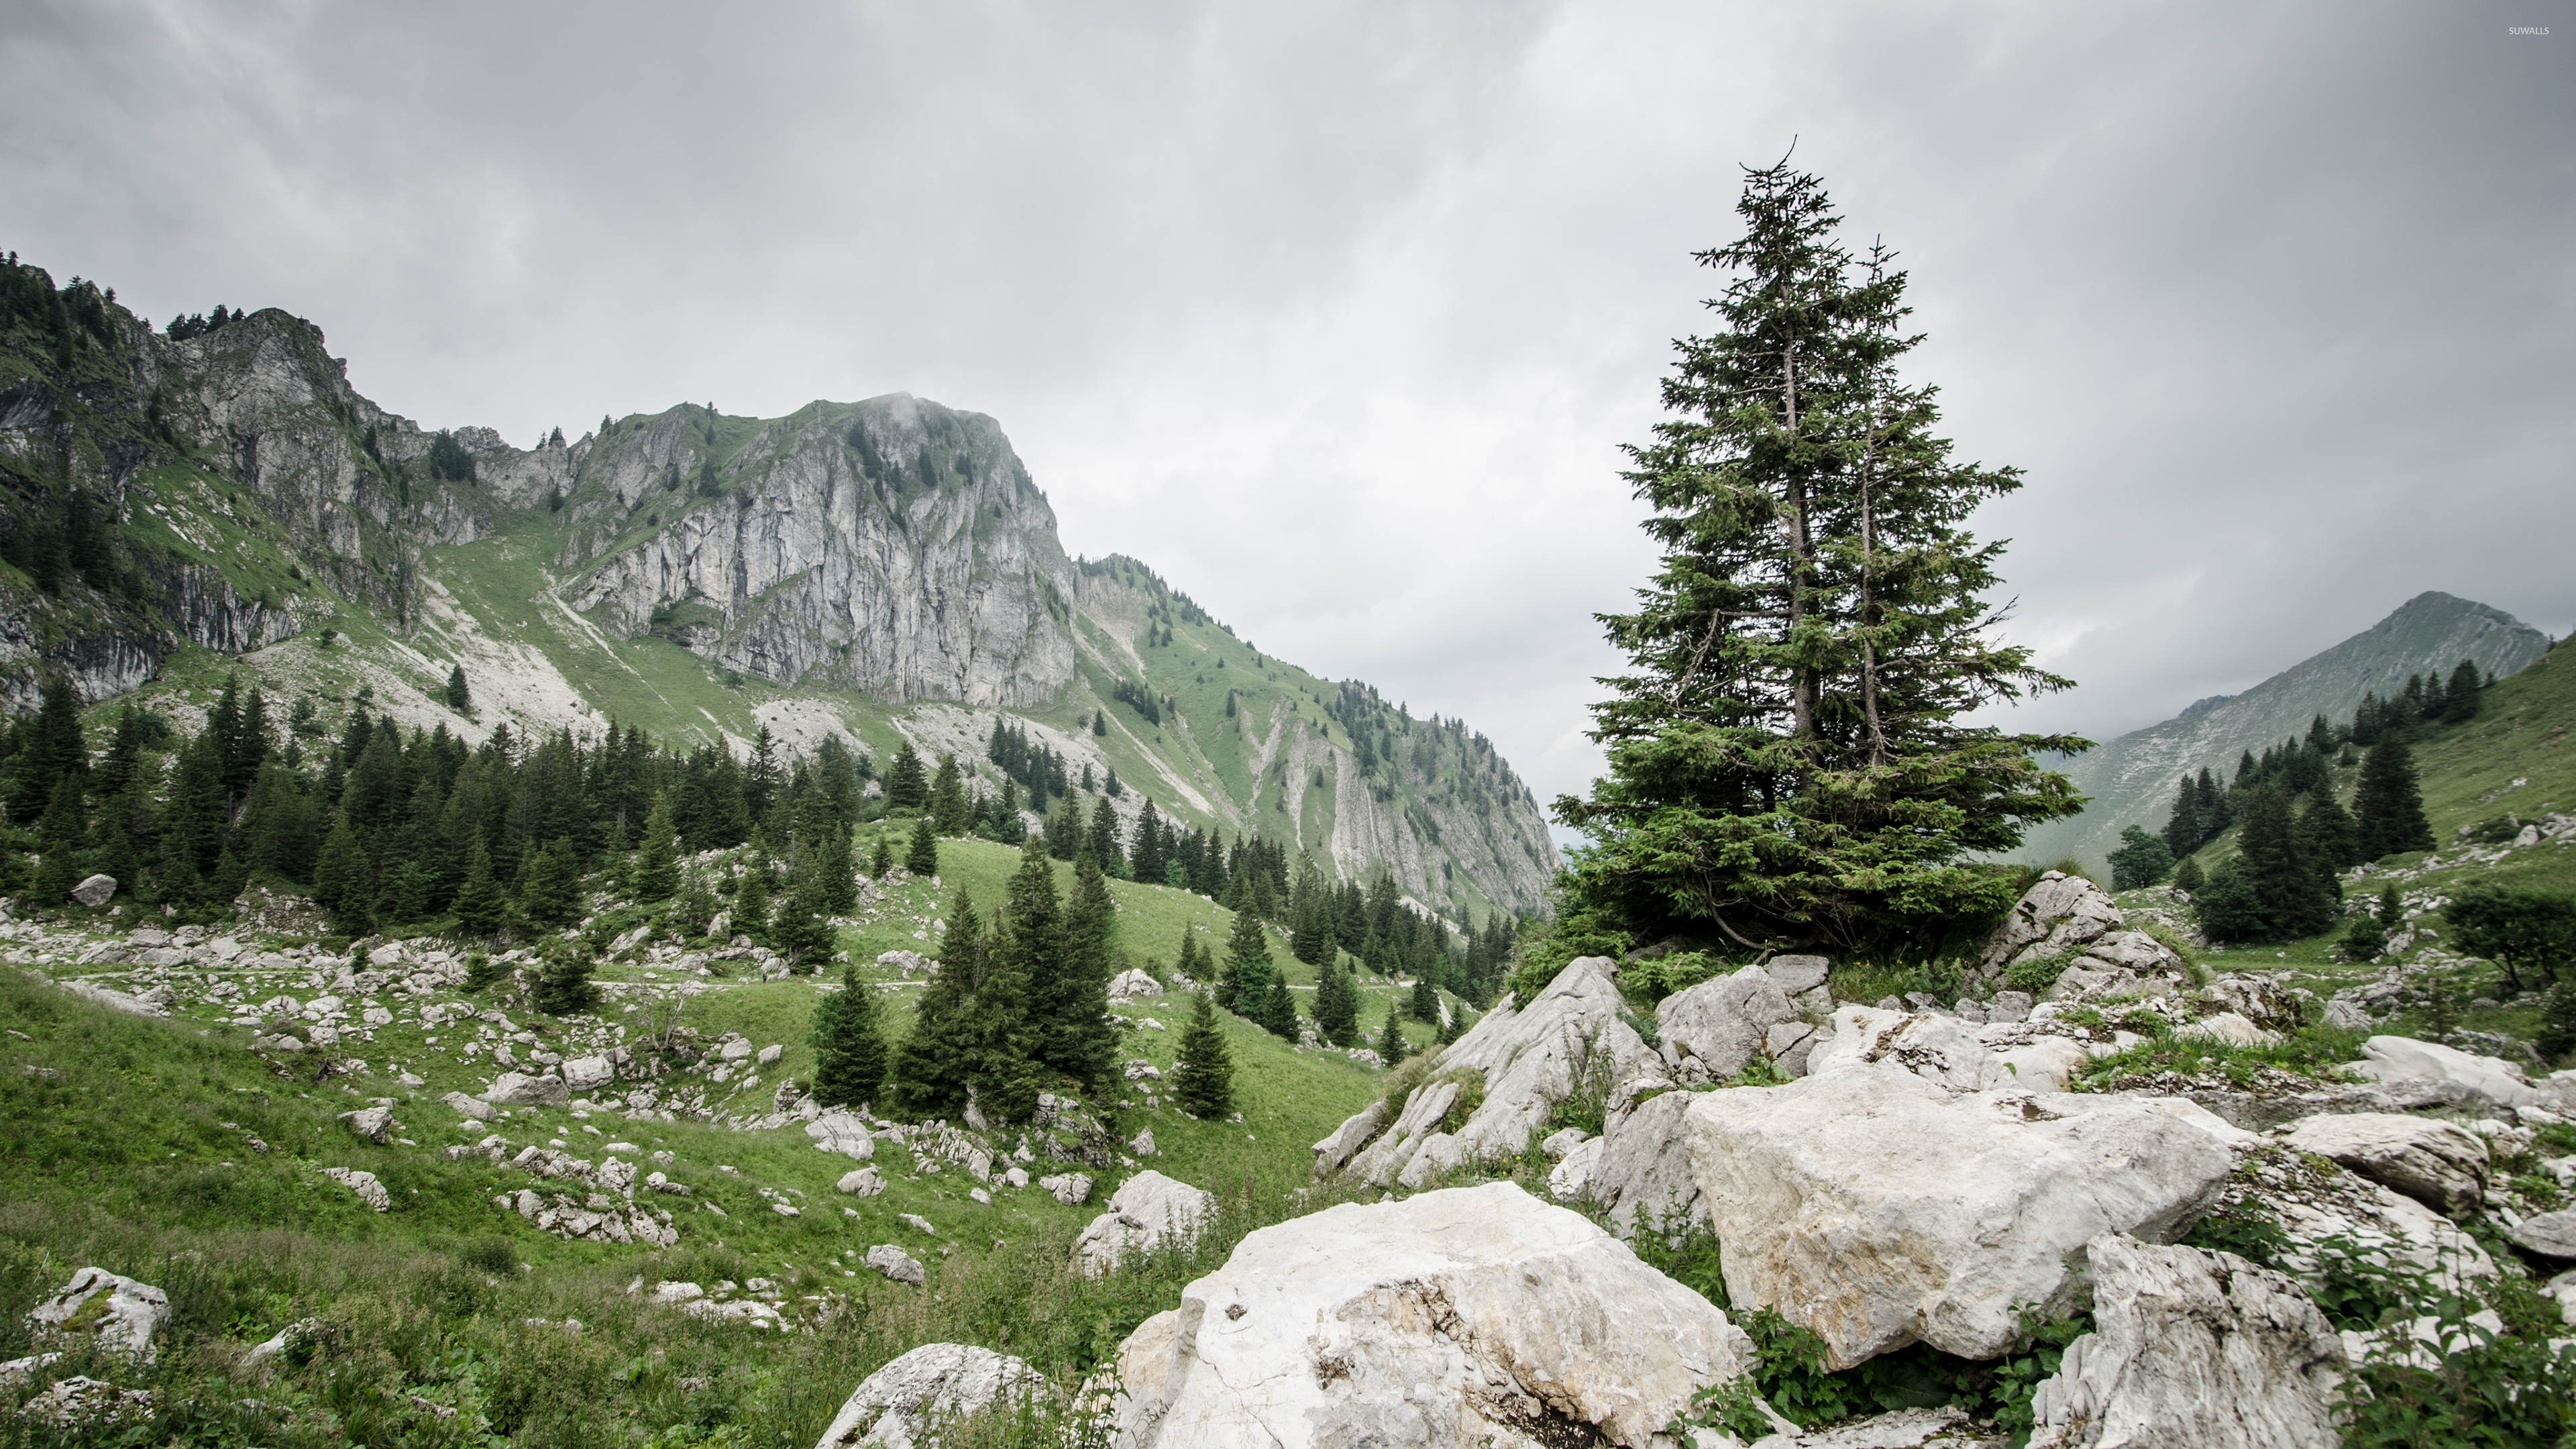 nature mountain rocky - photo #7